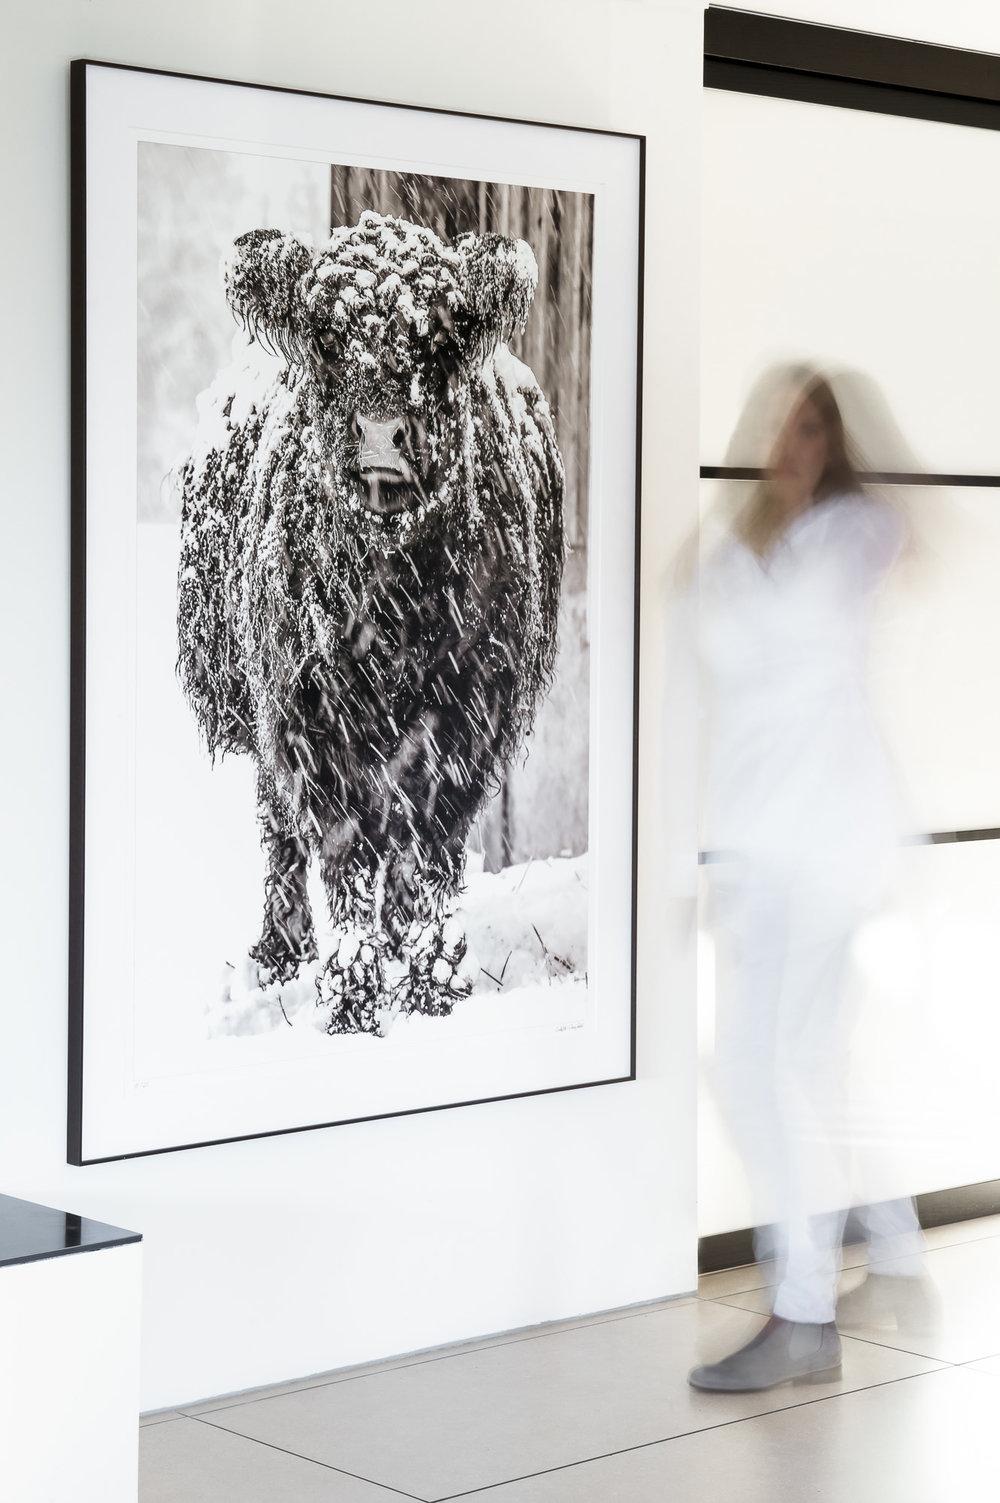 Carolina 1 17/25, fine art print 100cm x 150cm Rahmen Wenge 122cm x 174cm